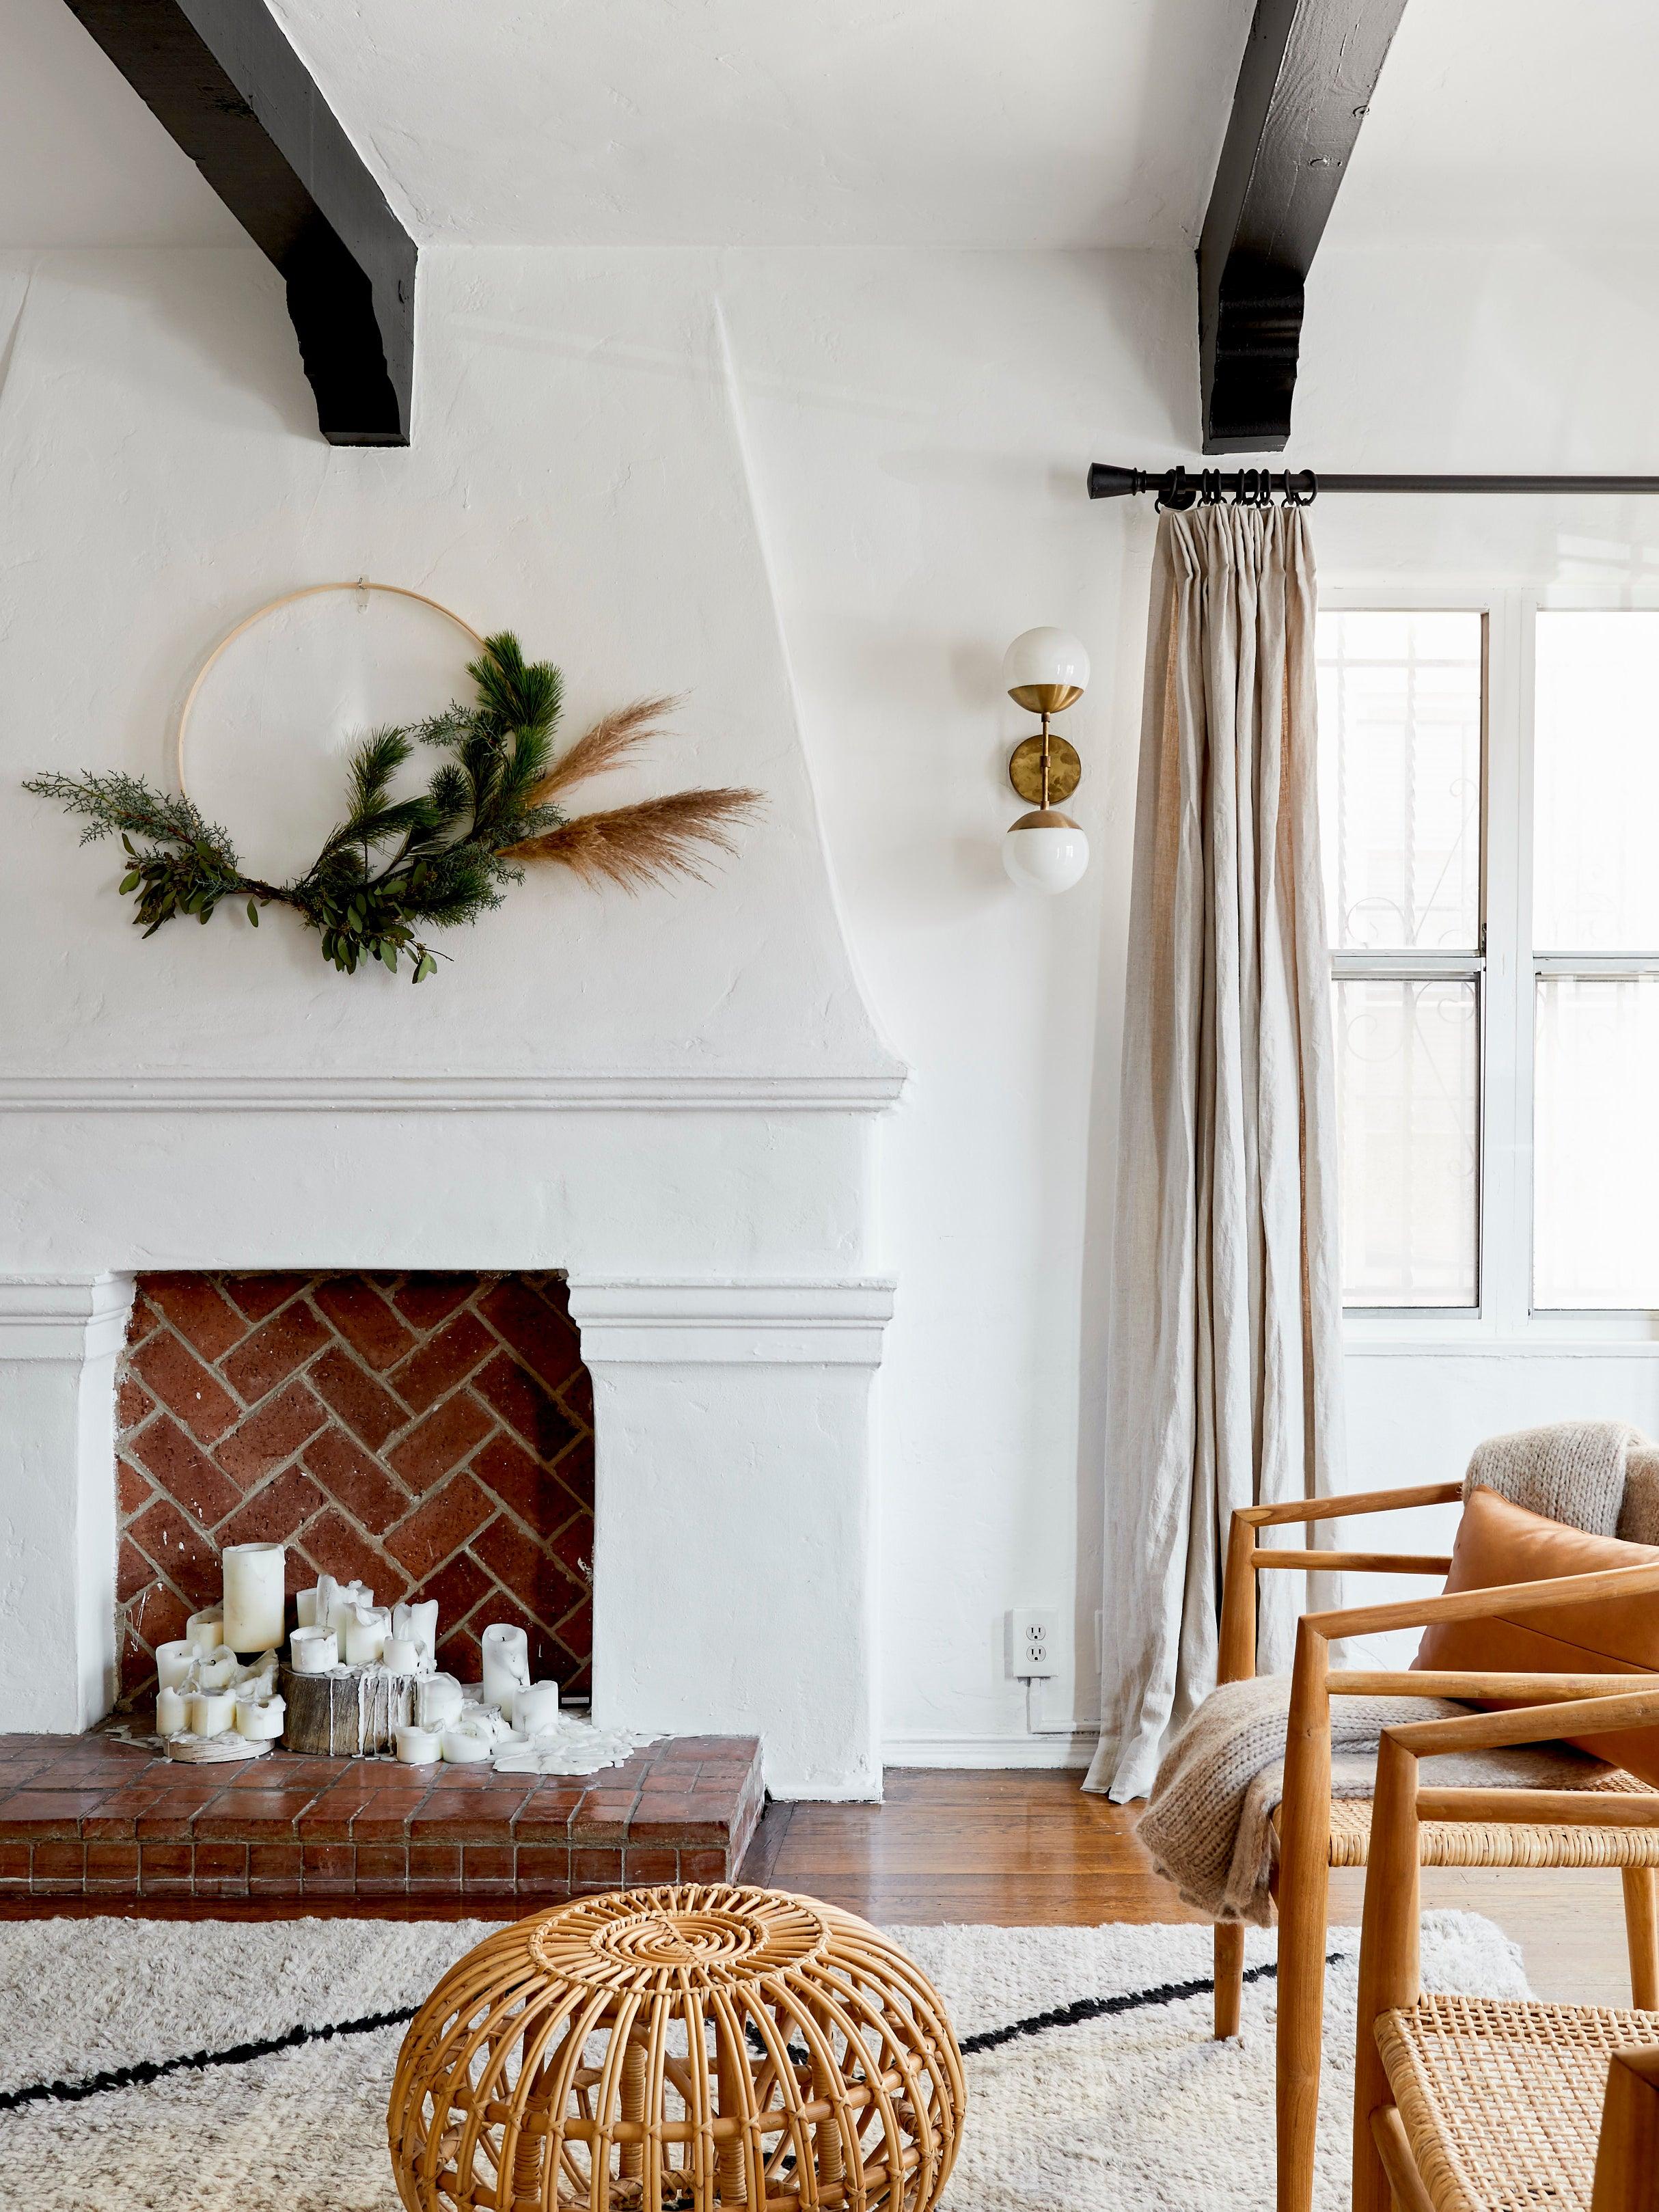 asymmetrical wreath over the mantel